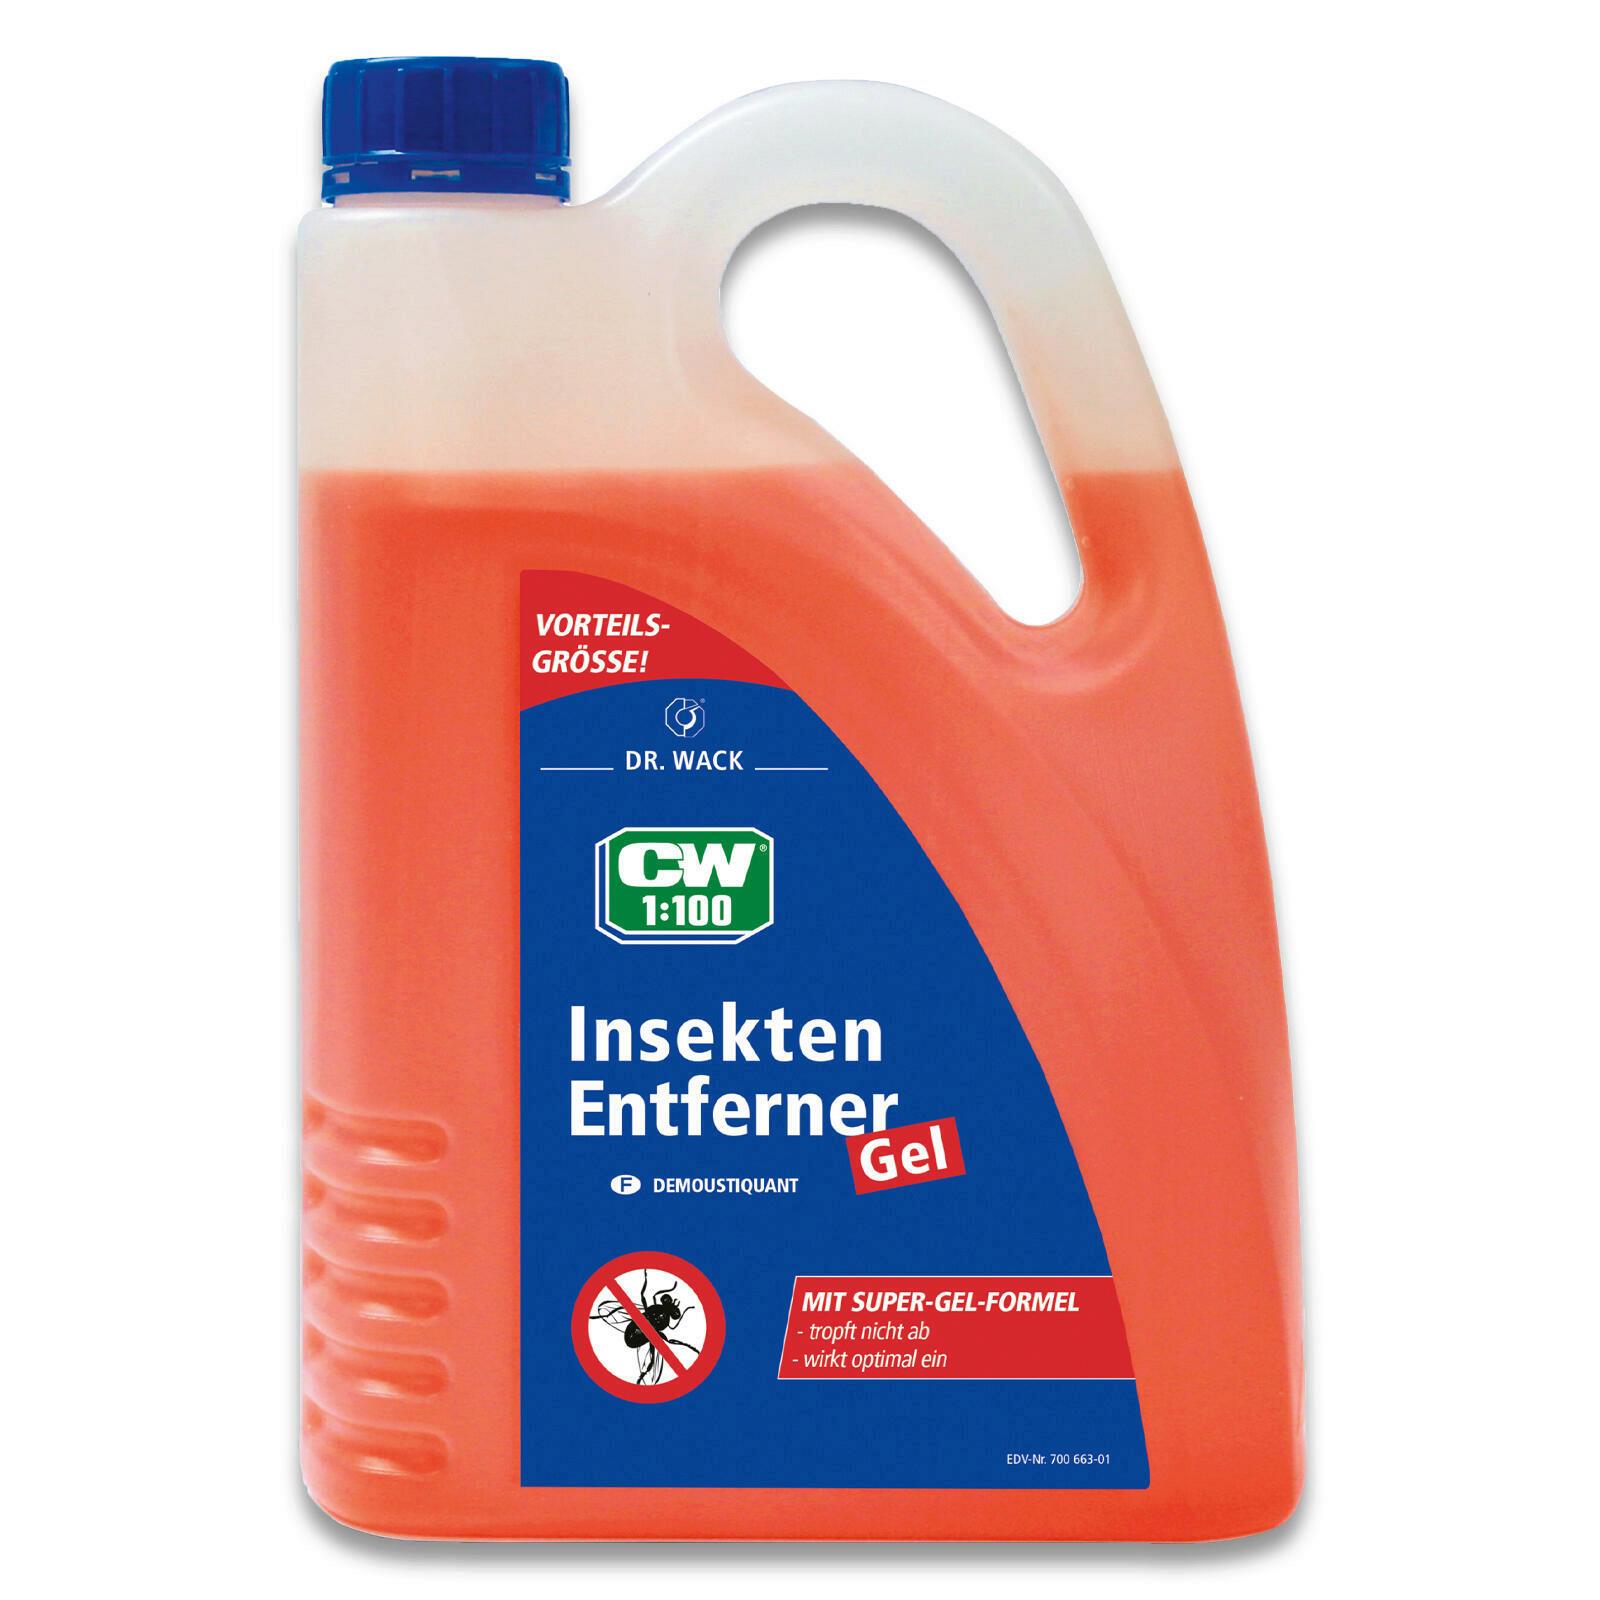 CW1:100 Insekten-Entferner Gel 2L